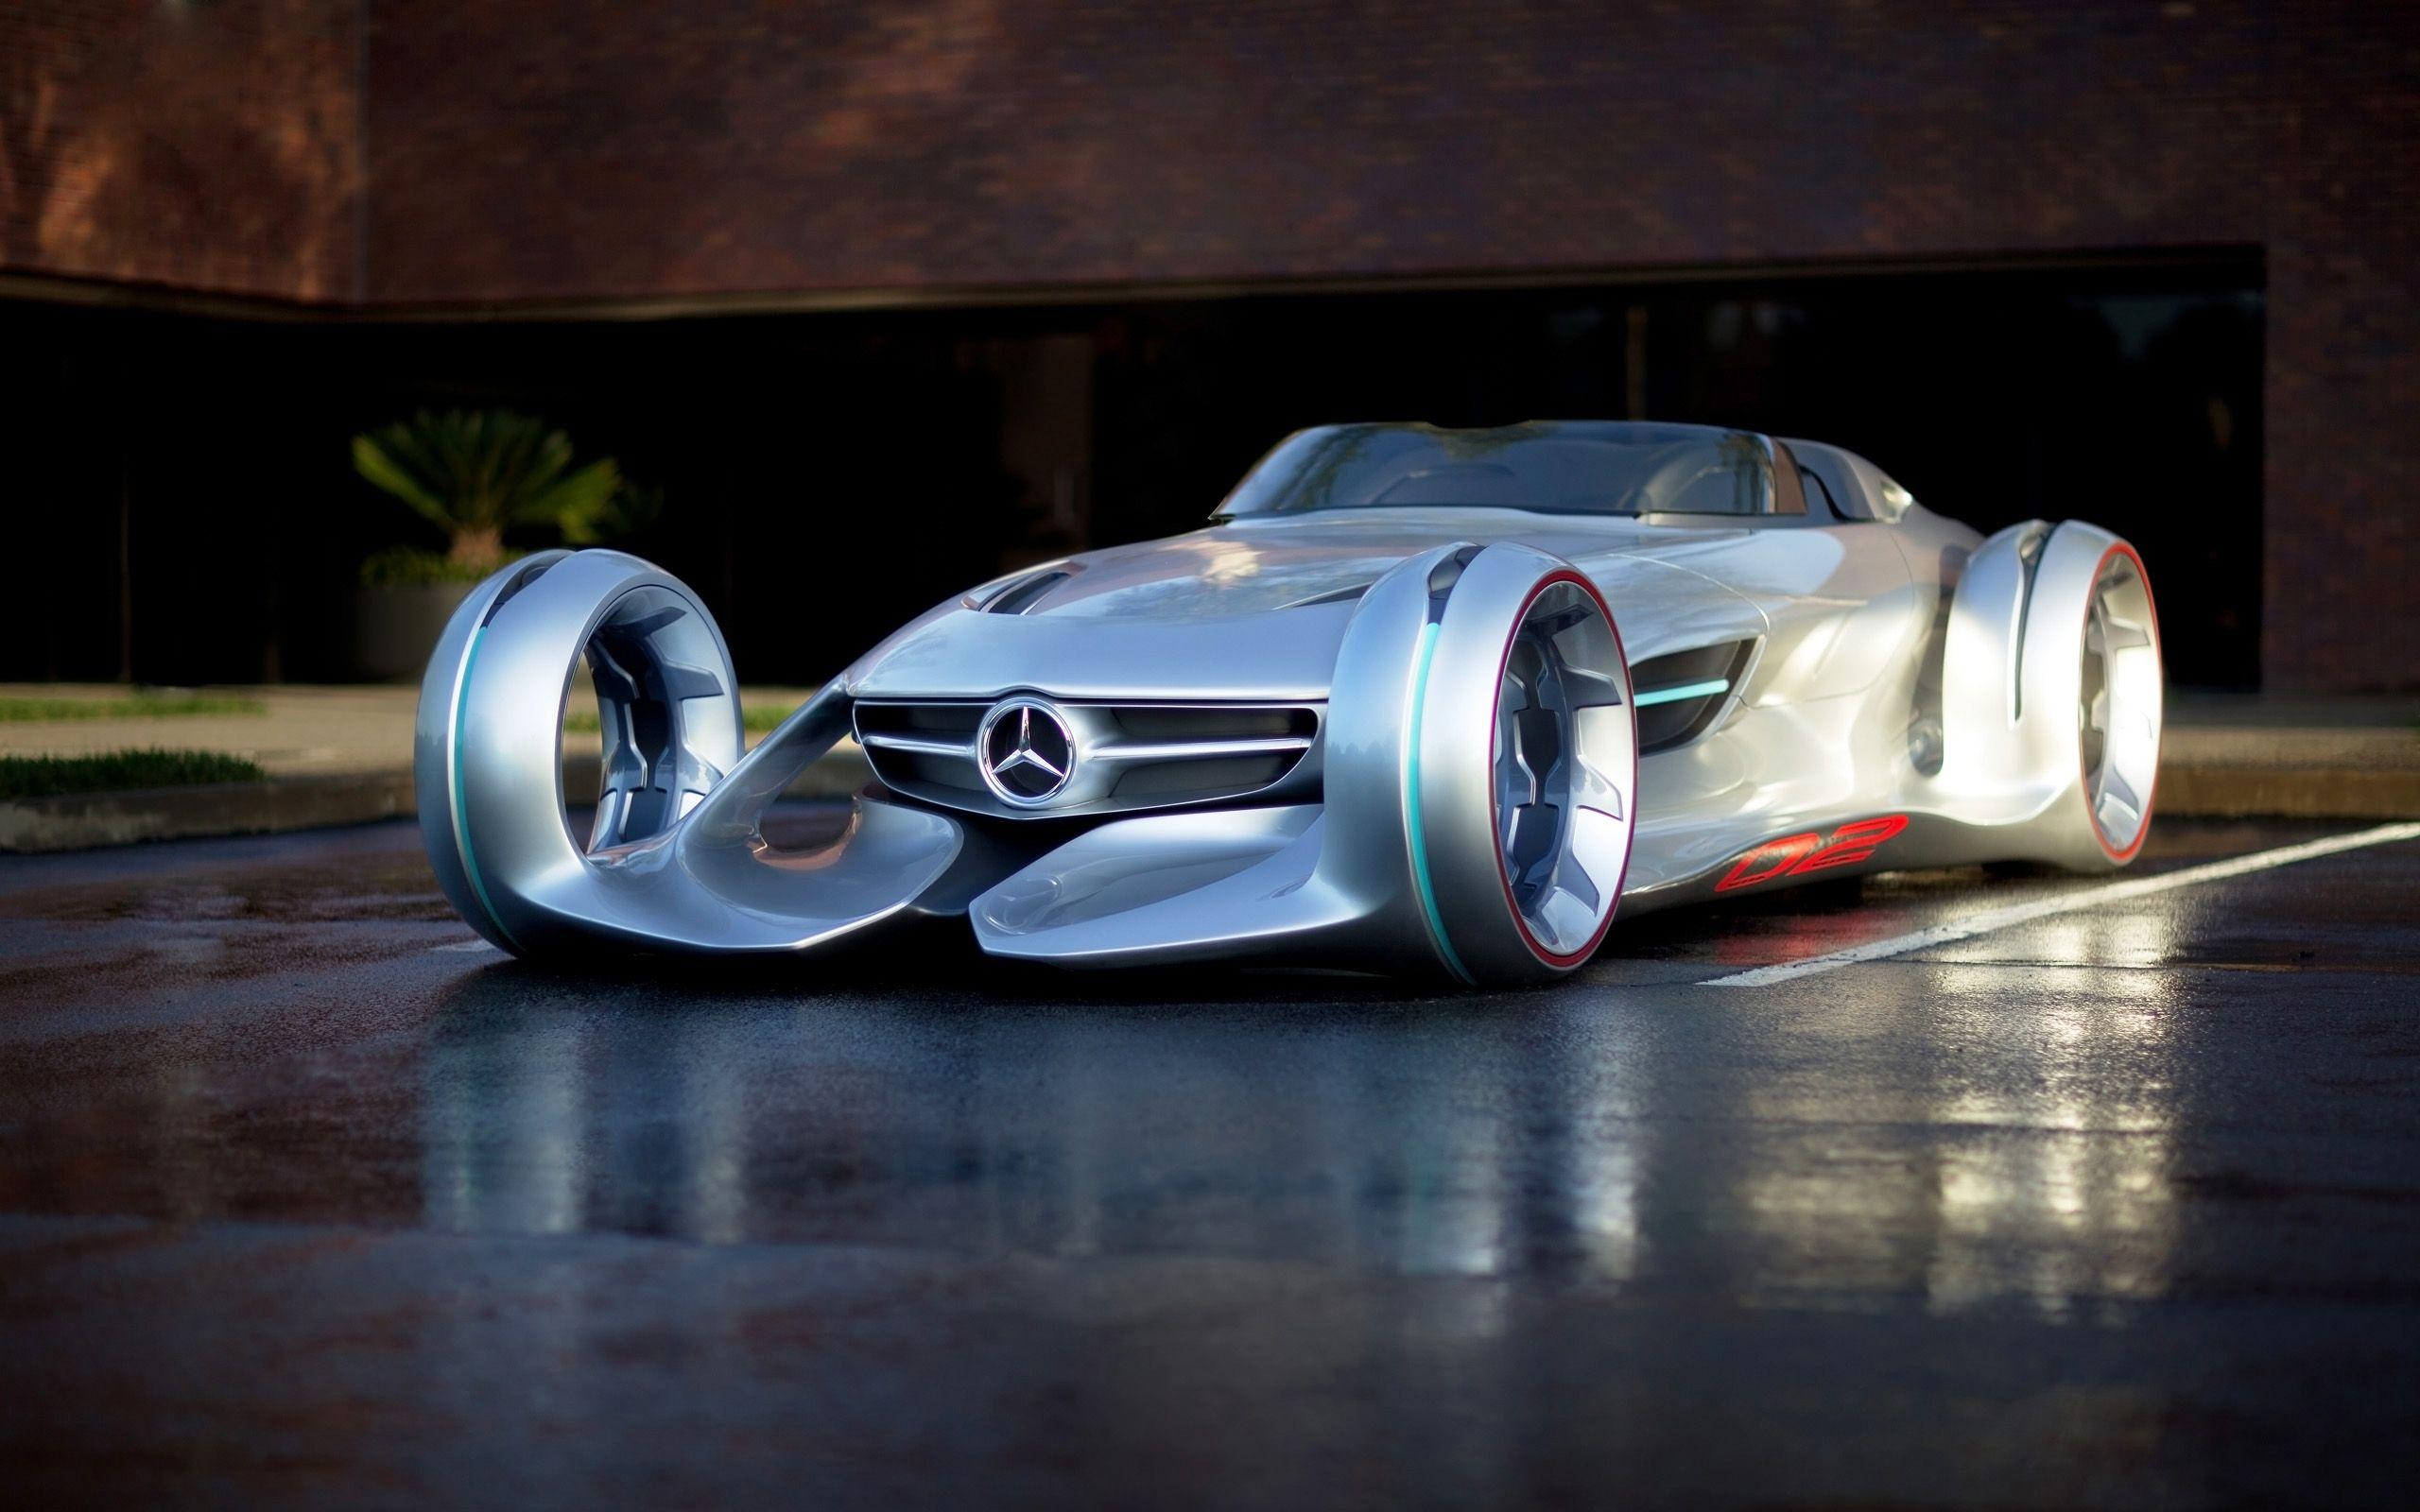 Mercedes Benz Bugatti Concept Wallpapers Mercedes Benz Biome Concept Cars Mercedes Concept